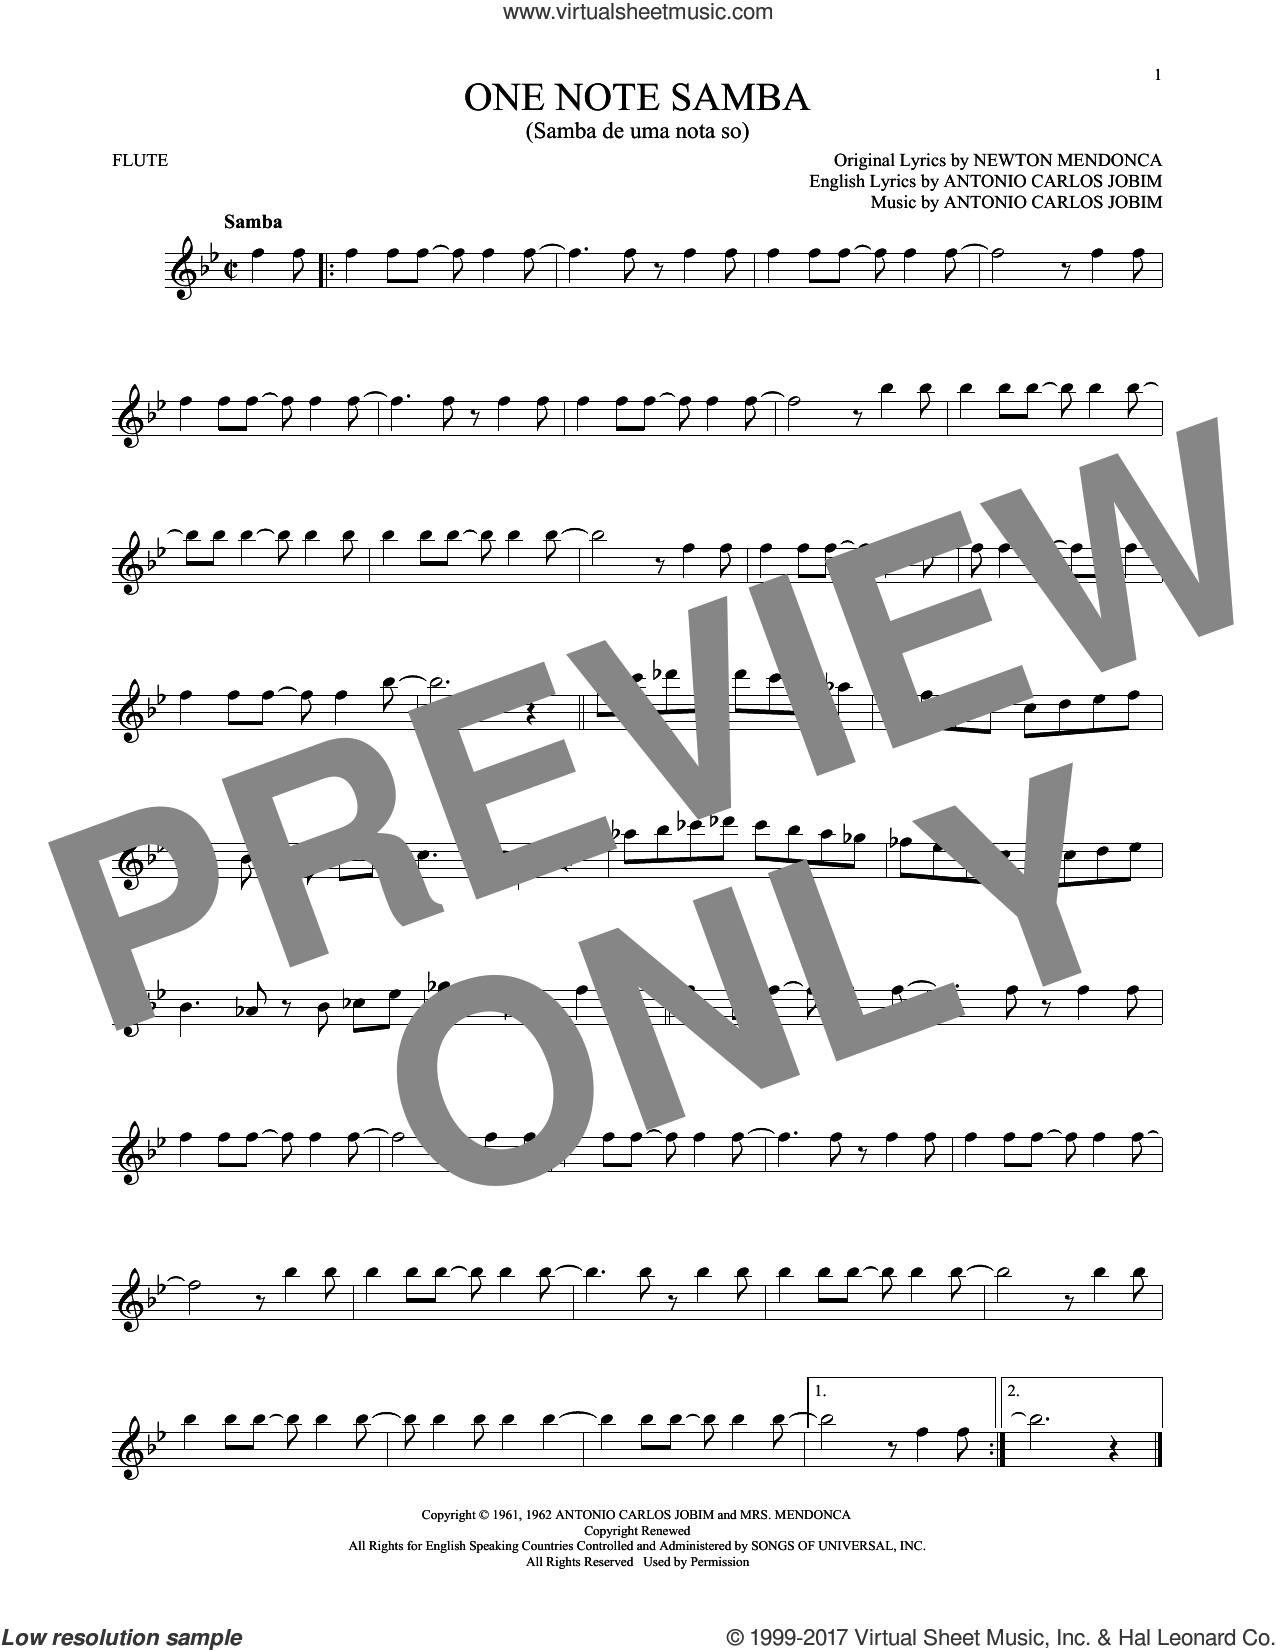 One Note Samba (Samba De Uma Nota So) sheet music for flute solo by Antonio Carlos Jobim, Pat Thomas and Newton Mendonca, intermediate skill level